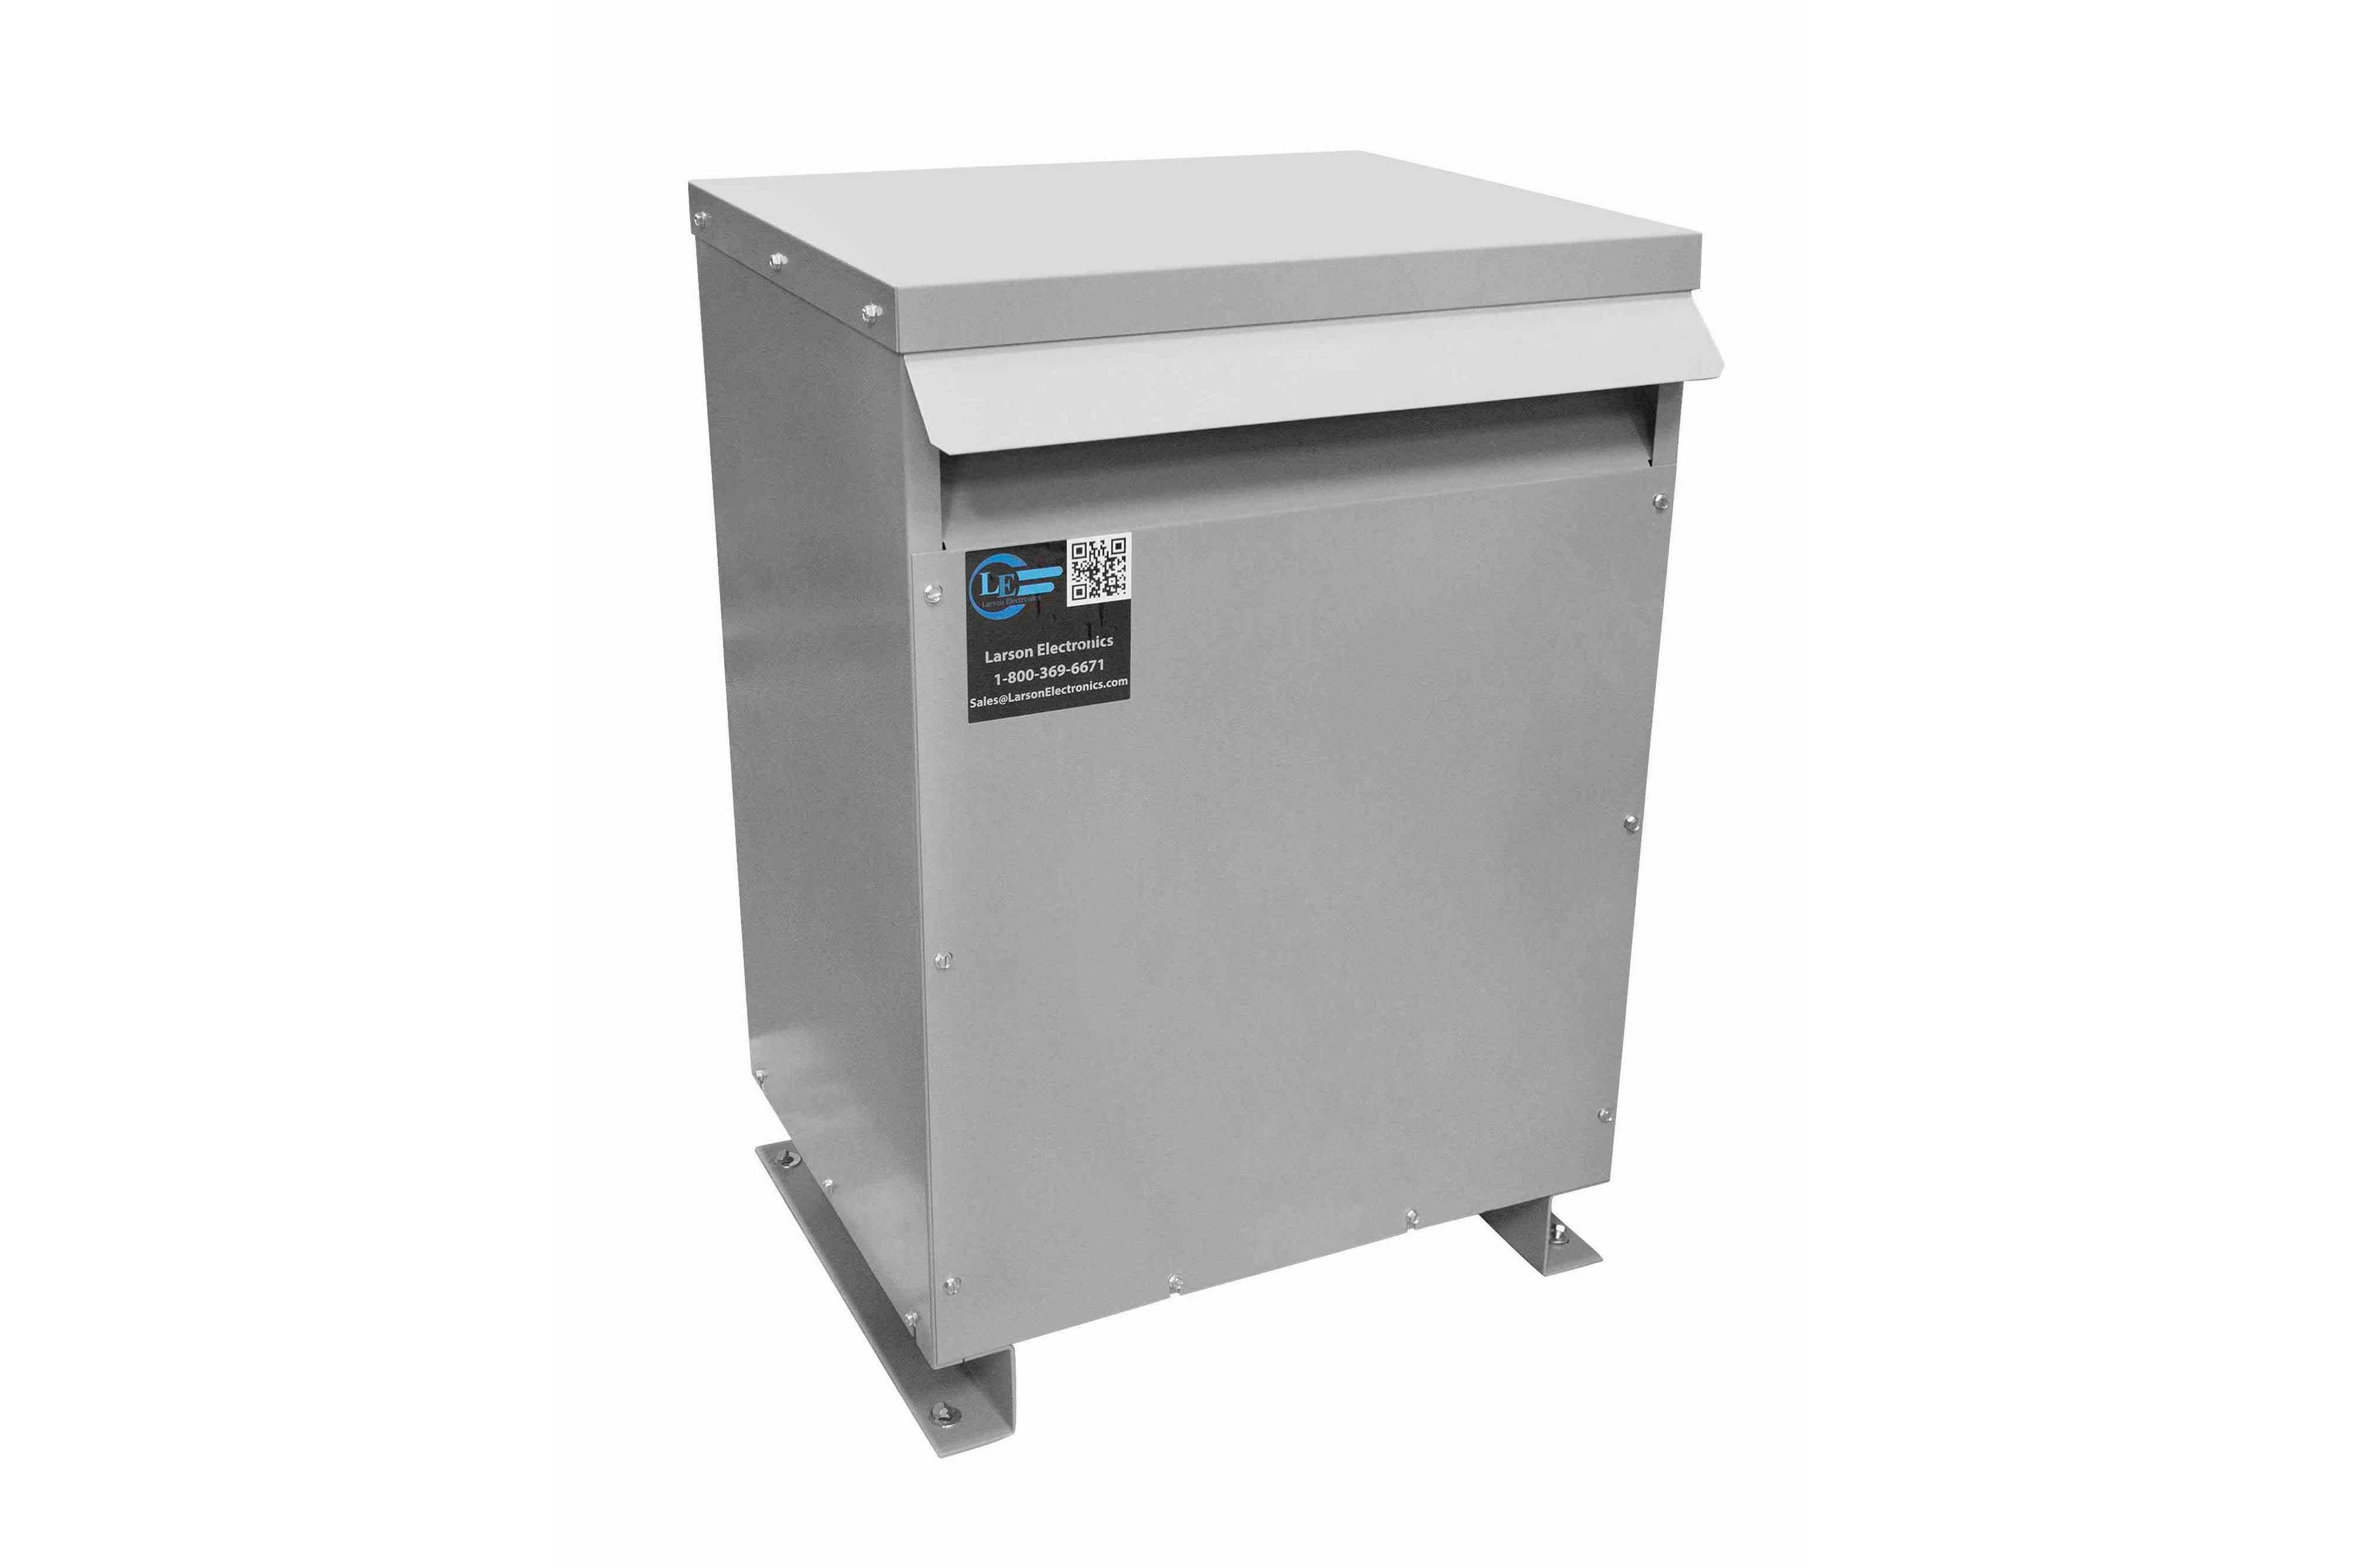 35 kVA 3PH Isolation Transformer, 440V Wye Primary, 208Y/120 Wye-N Secondary, N3R, Ventilated, 60 Hz